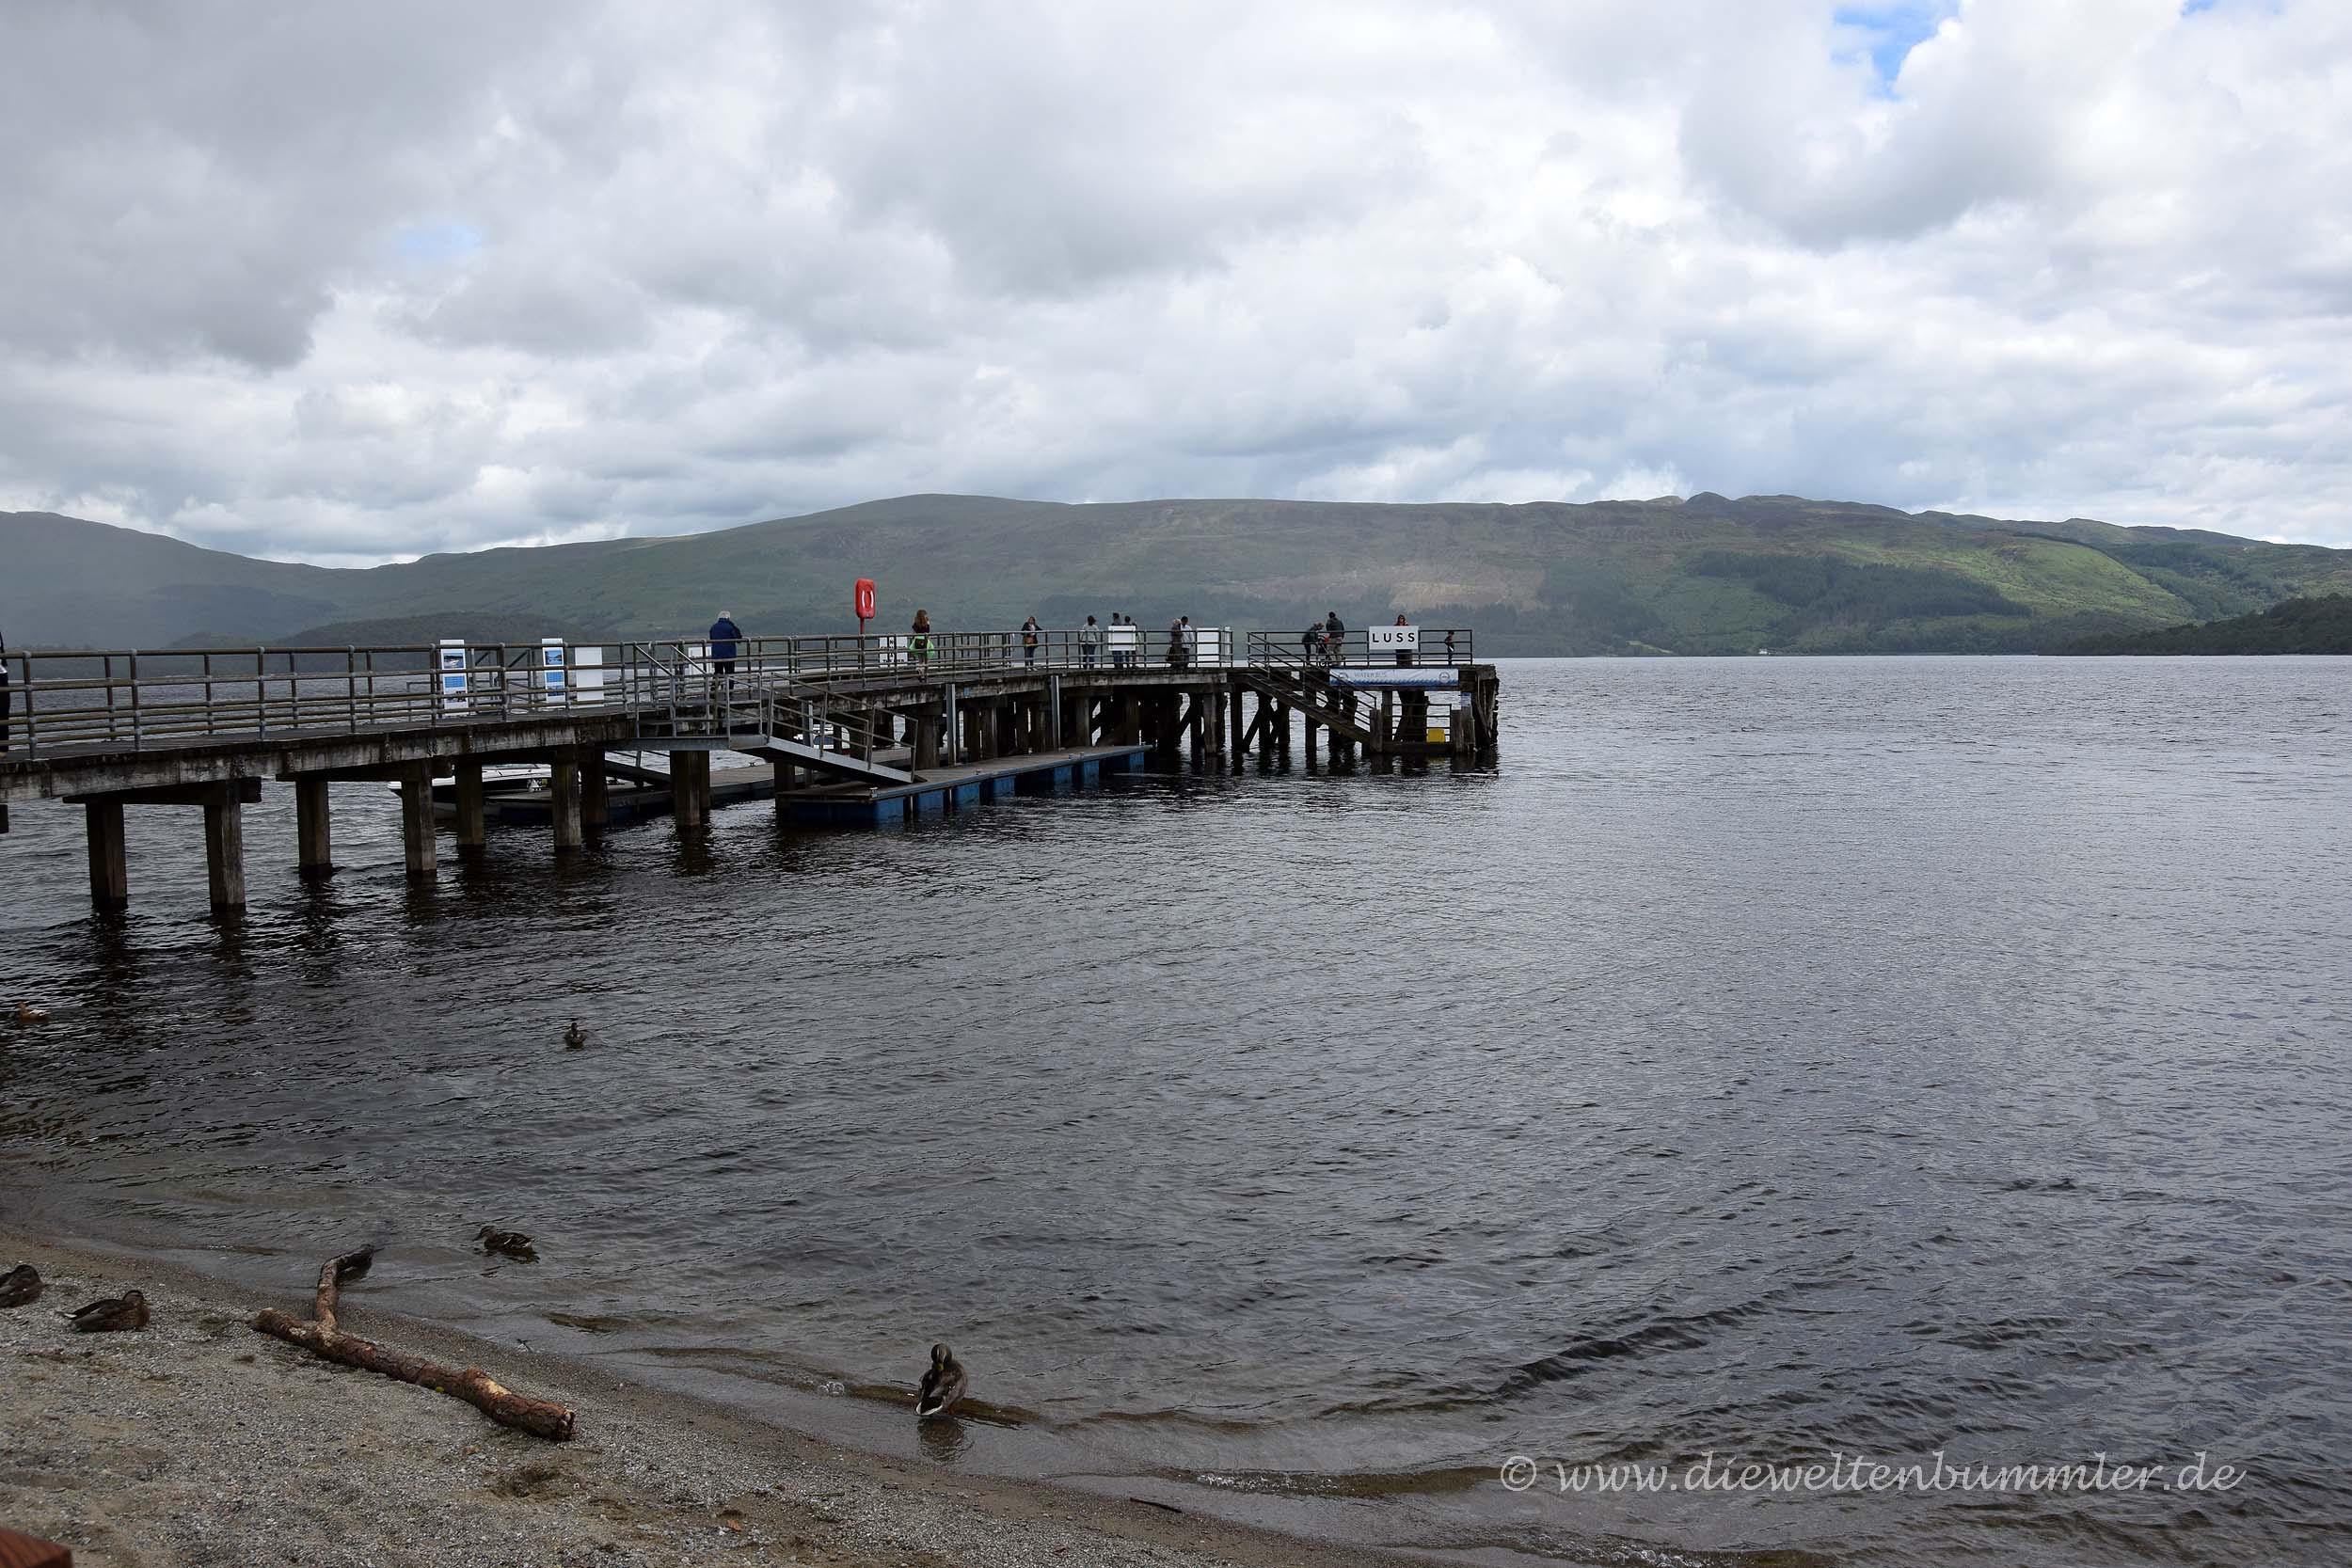 Steg am Loch Lomond